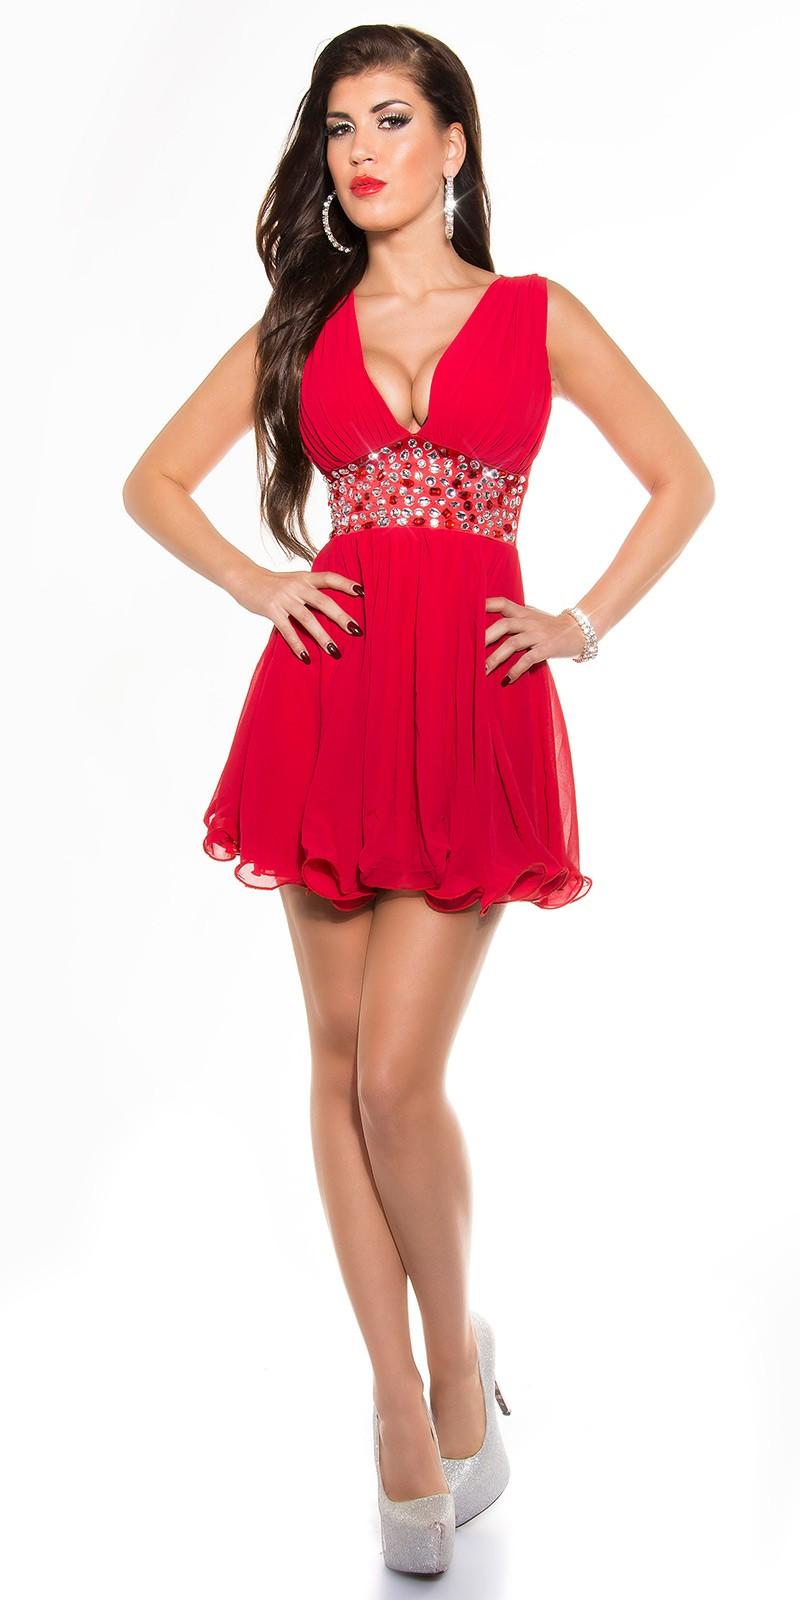 Babydoll női alkalmi ruha - Piros (36-42) empty 878bf20be6